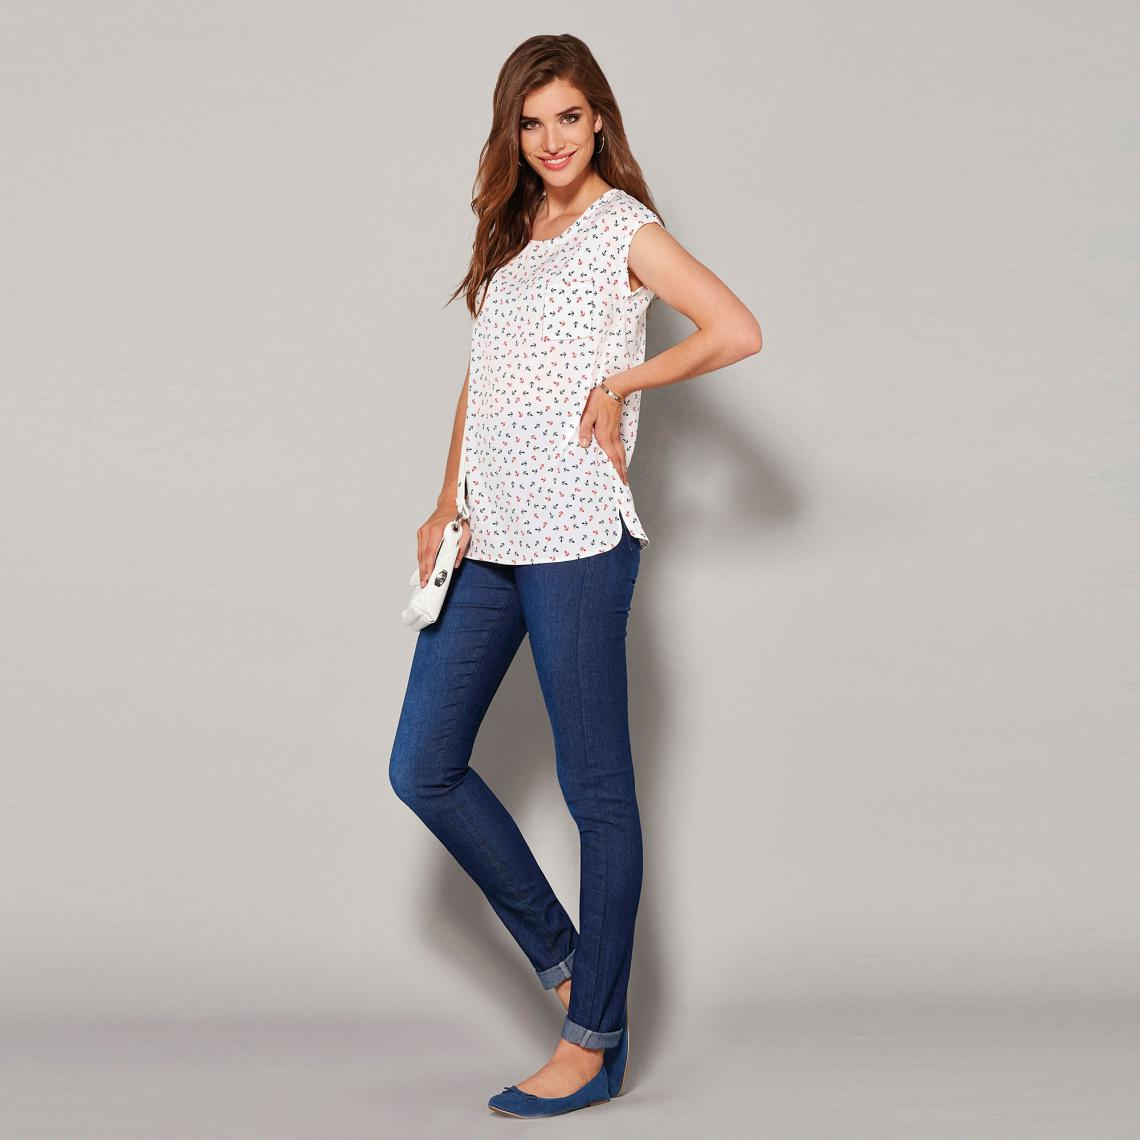 Tregging en jean élastique - Bleu - 3 SUISSES - Modalova